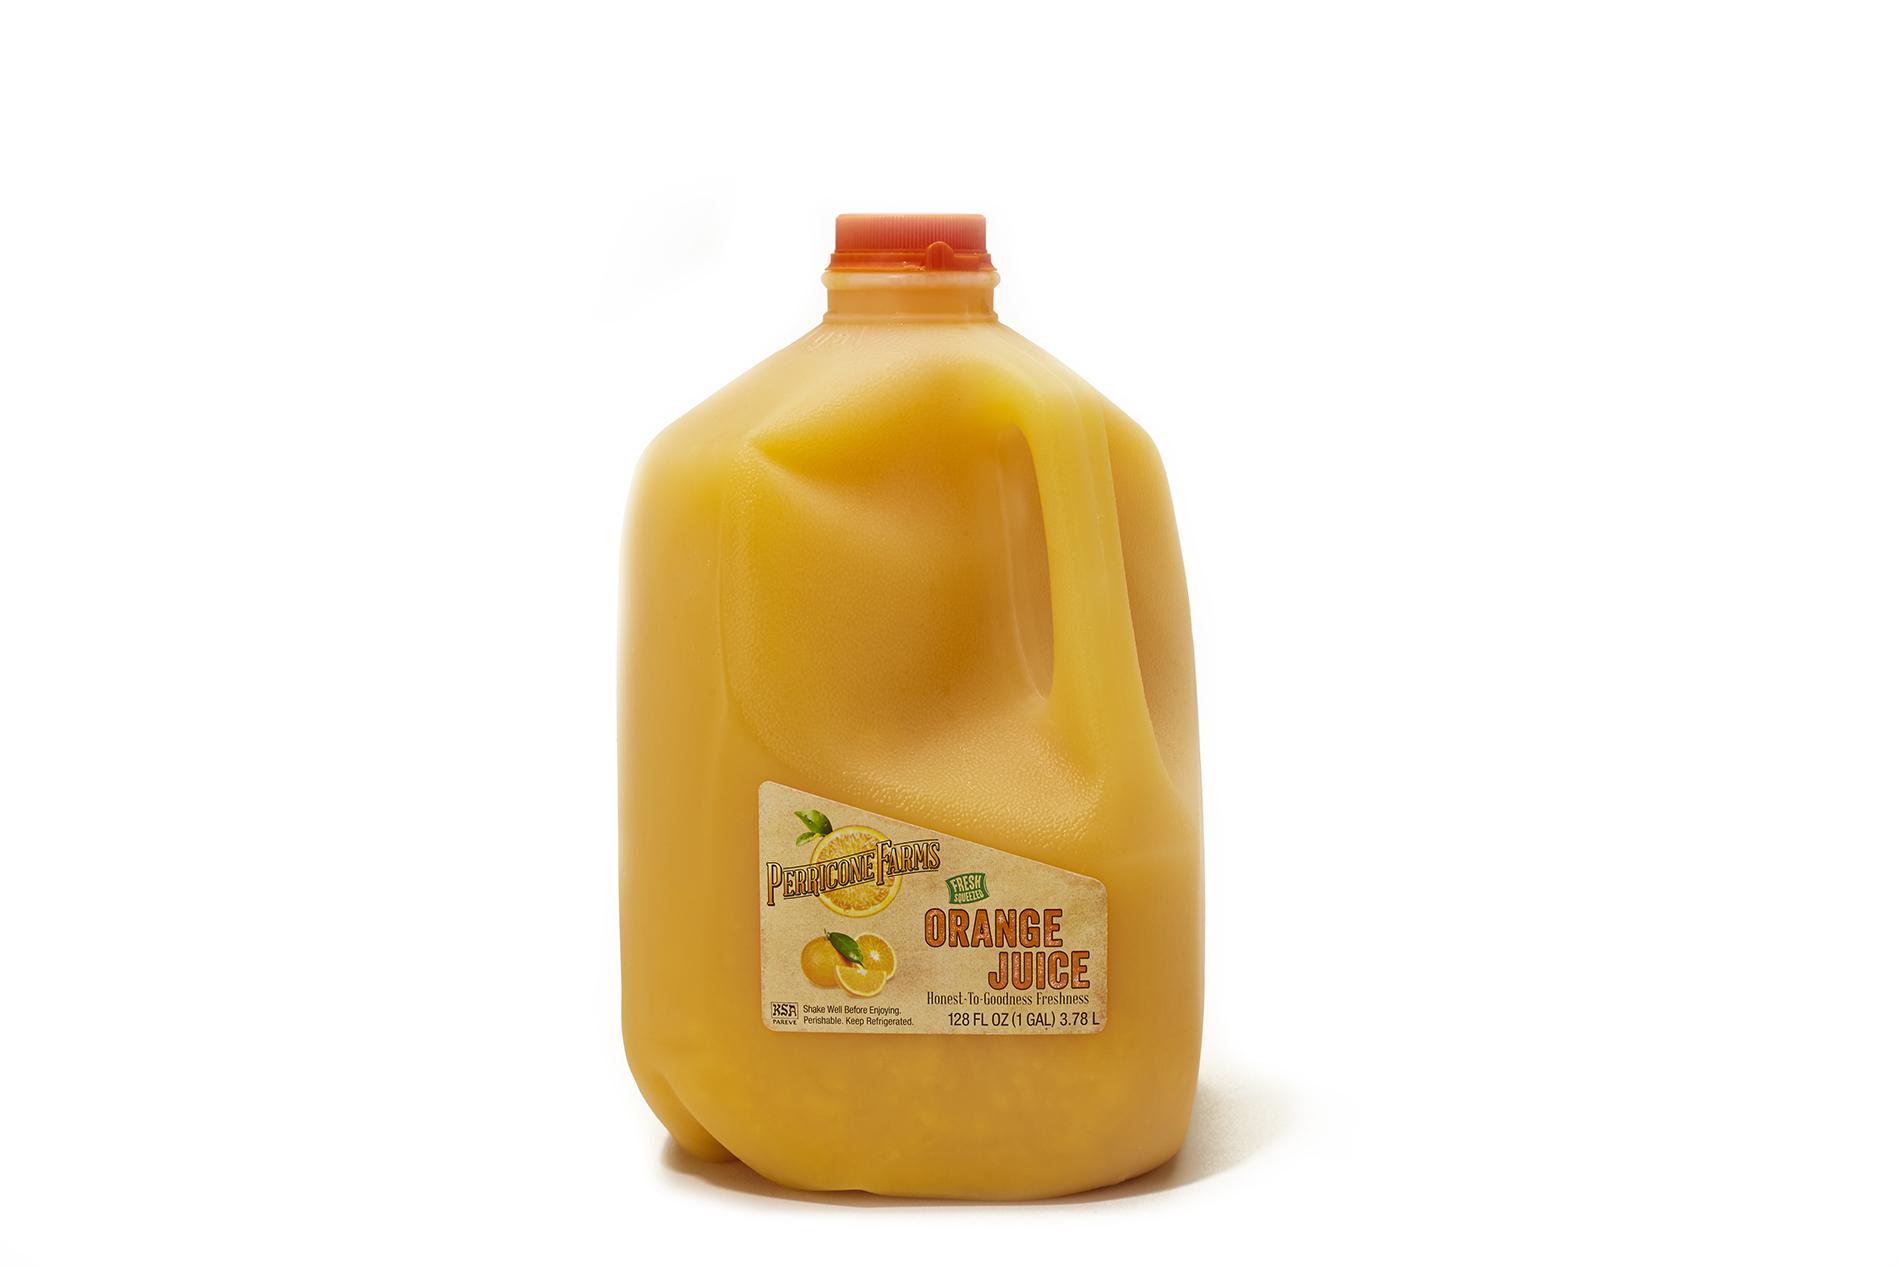 Gallon jug of fresh orange juice